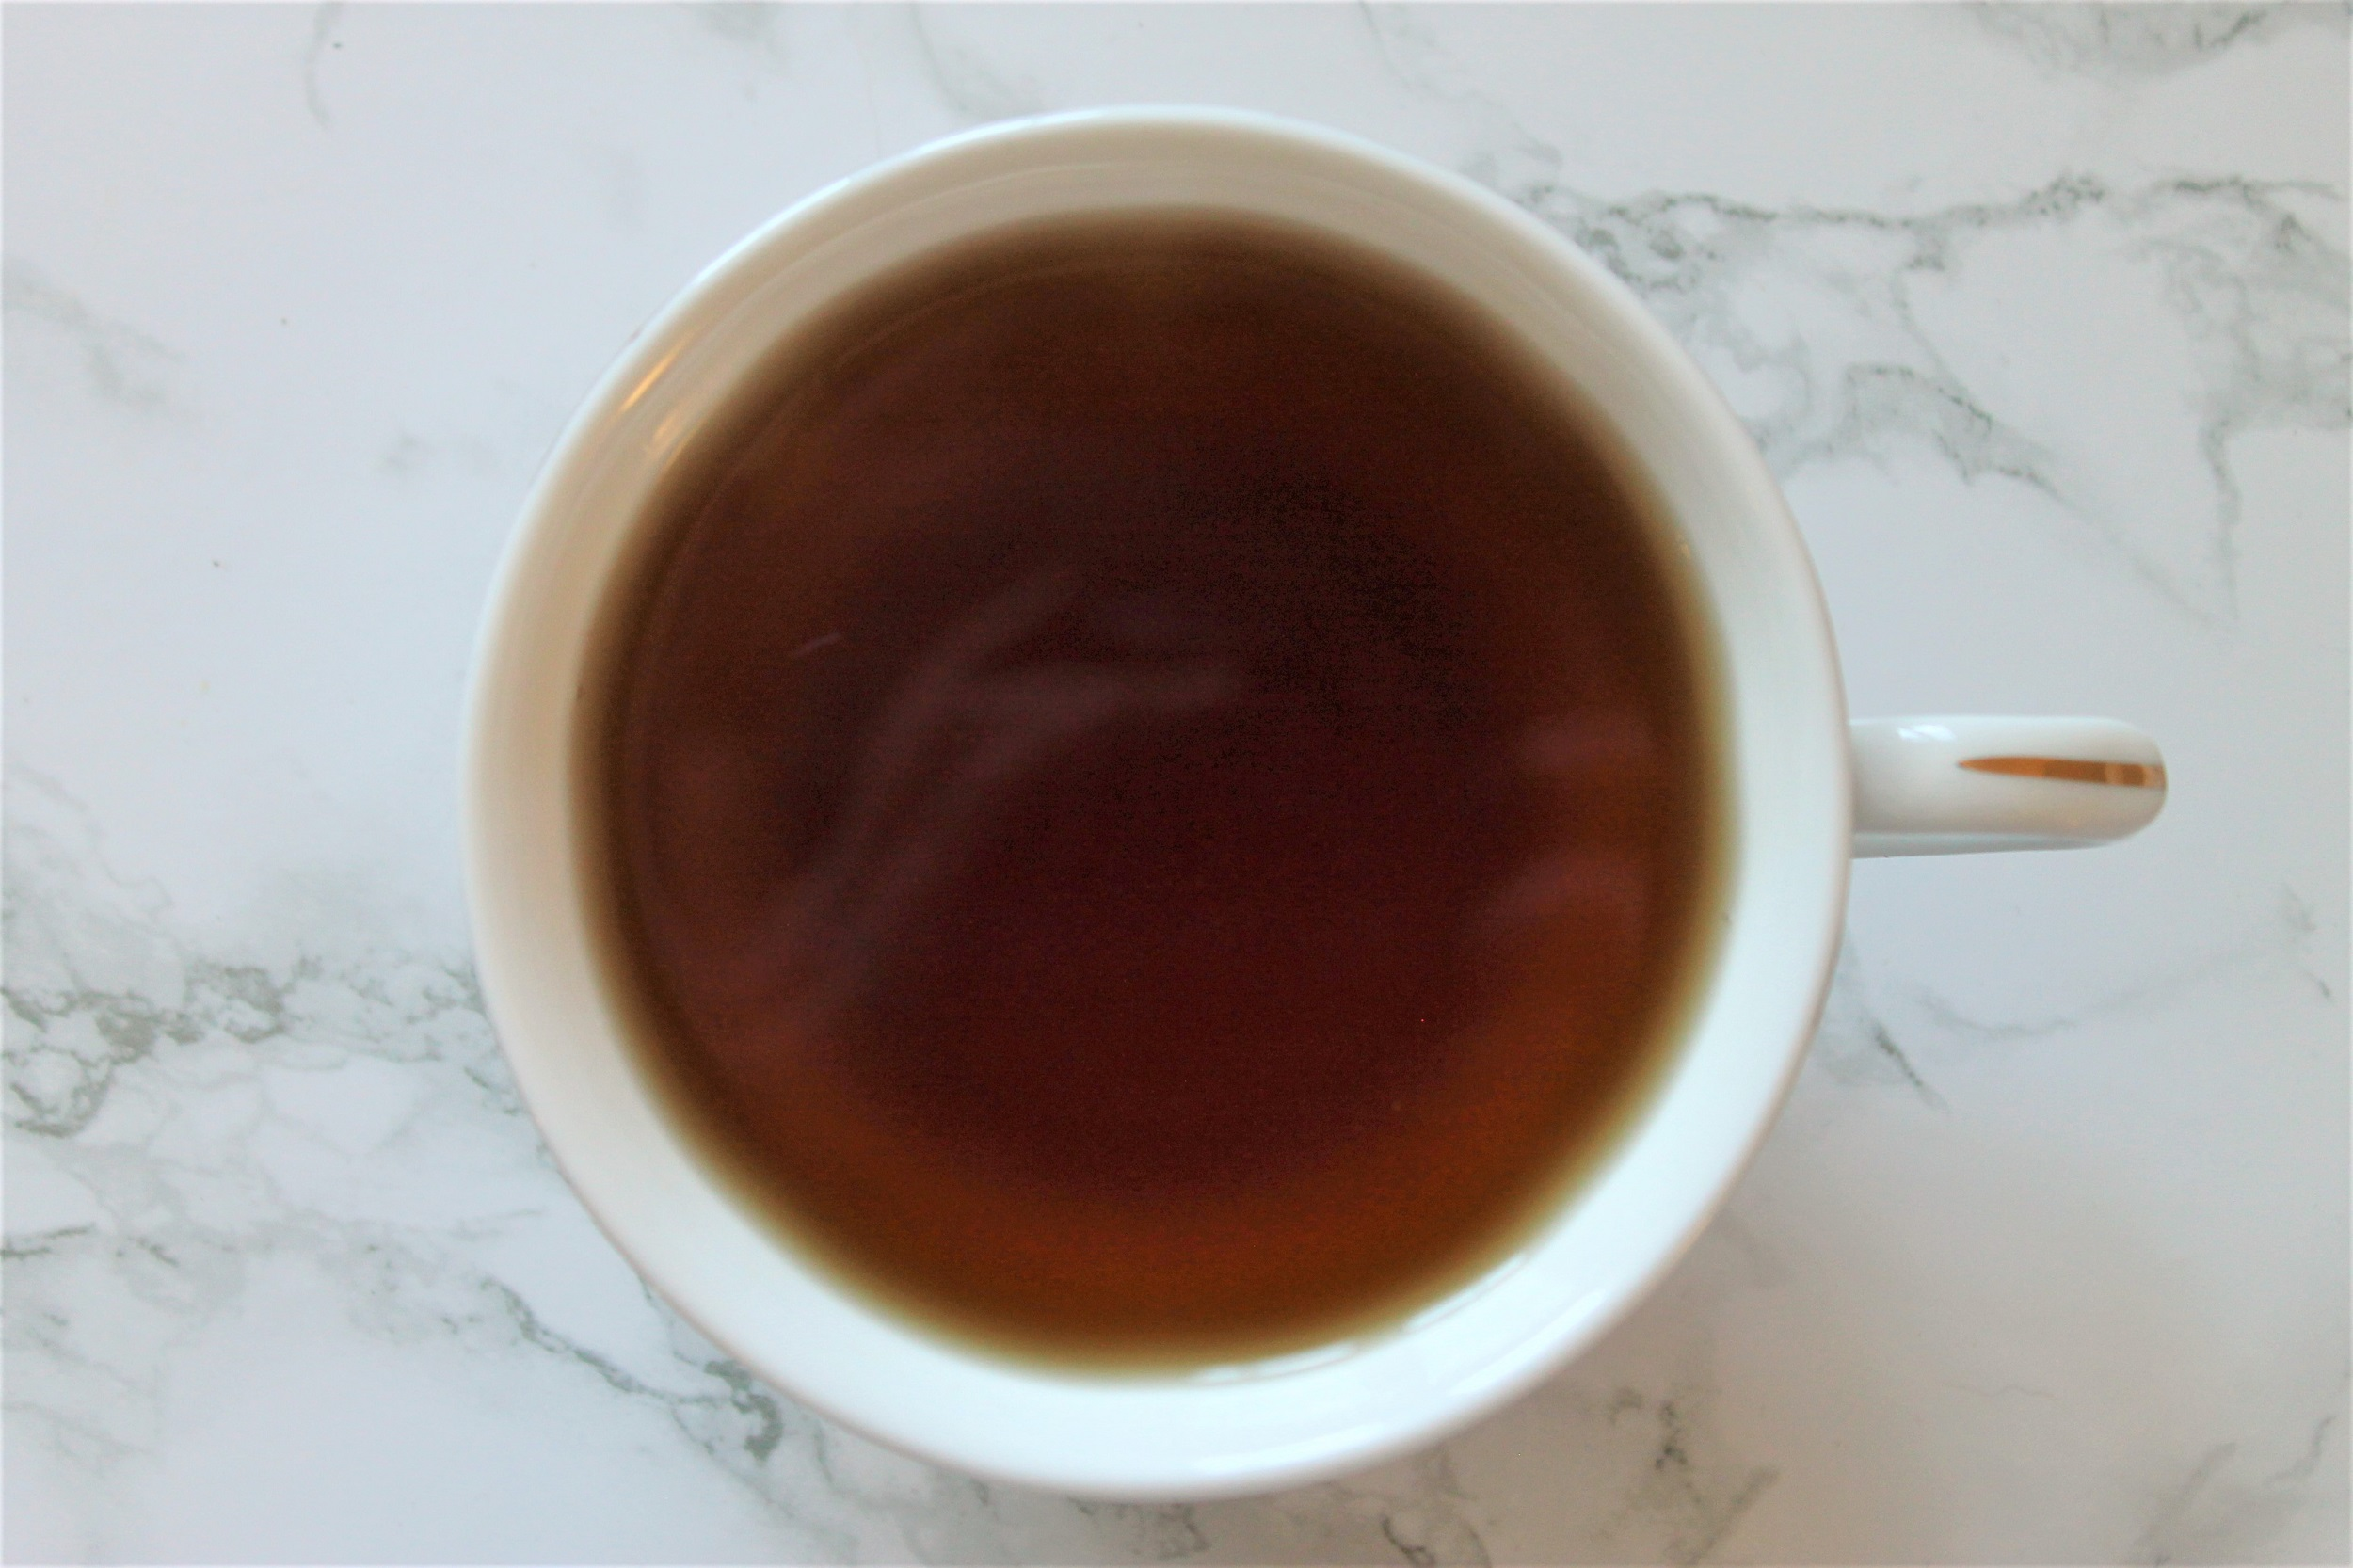 boh malaysian black tea cup